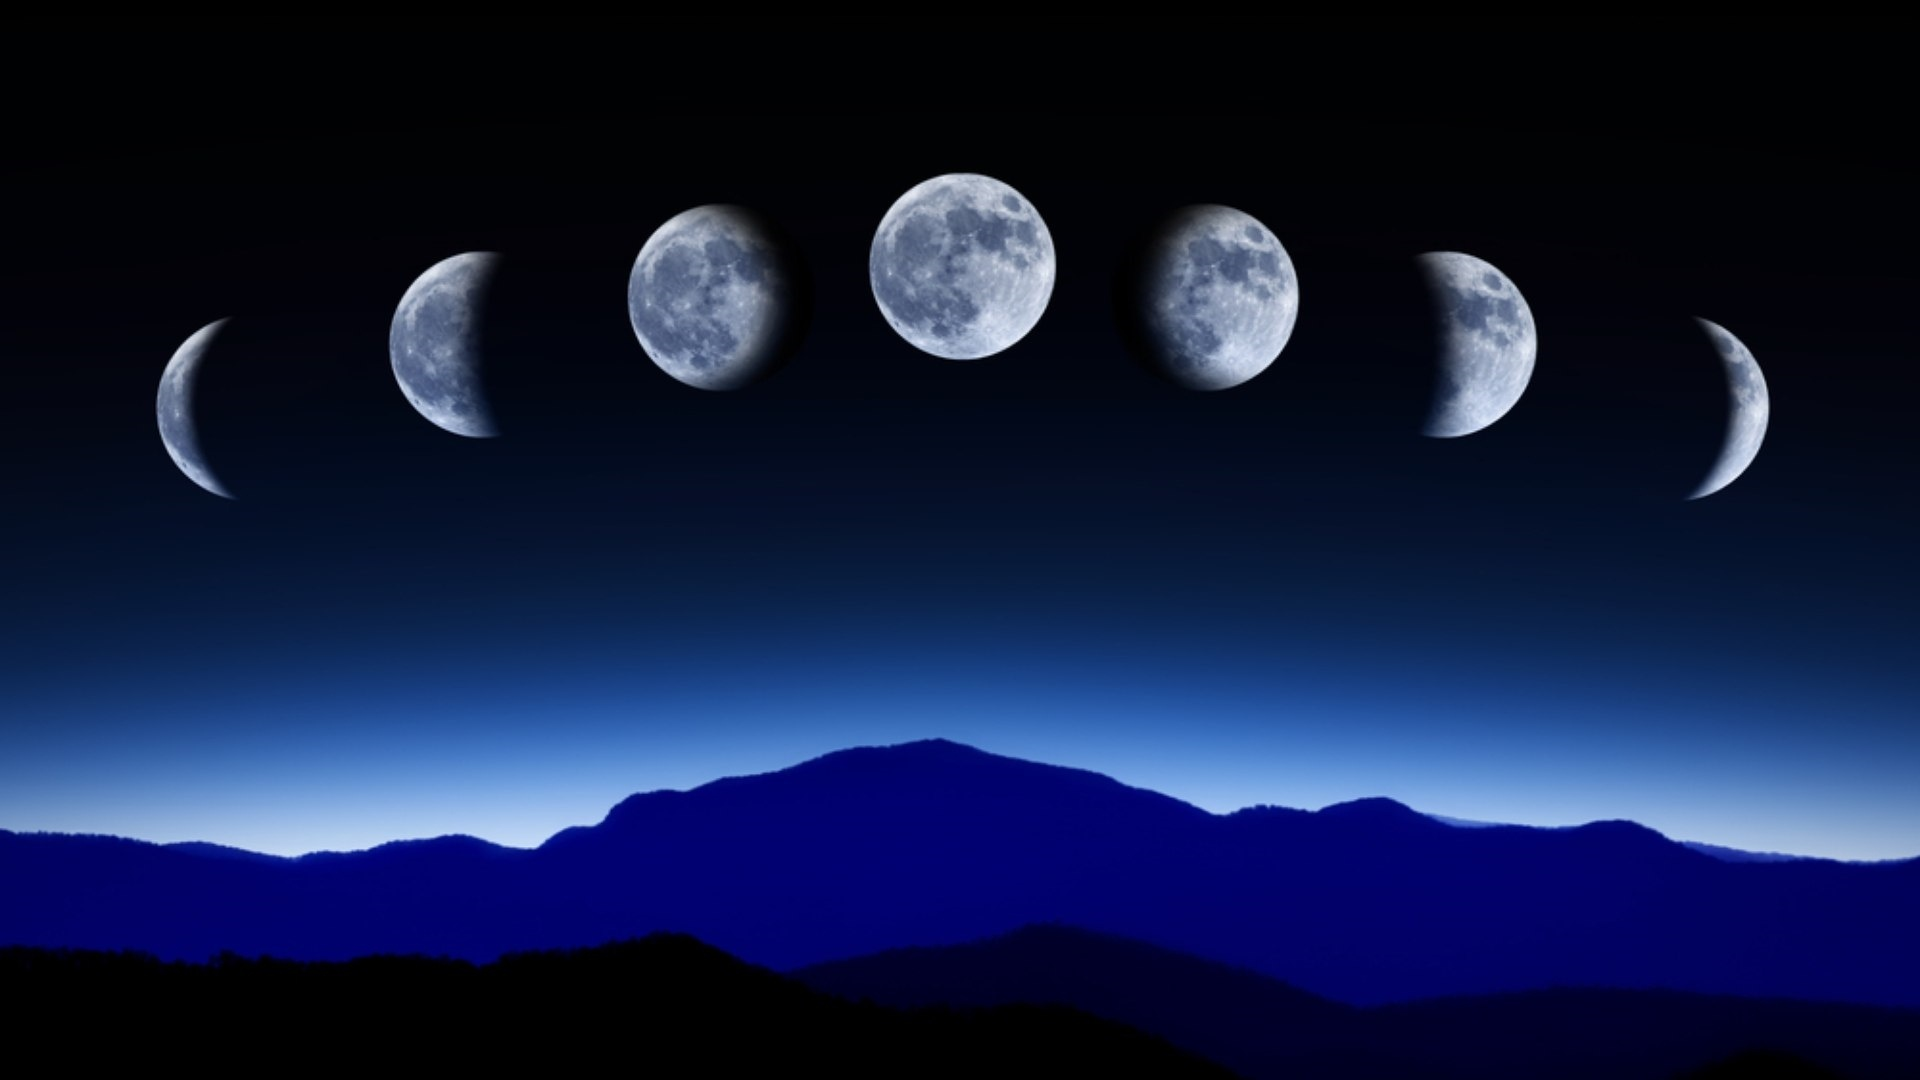 Moon Phases Wallpaper theme